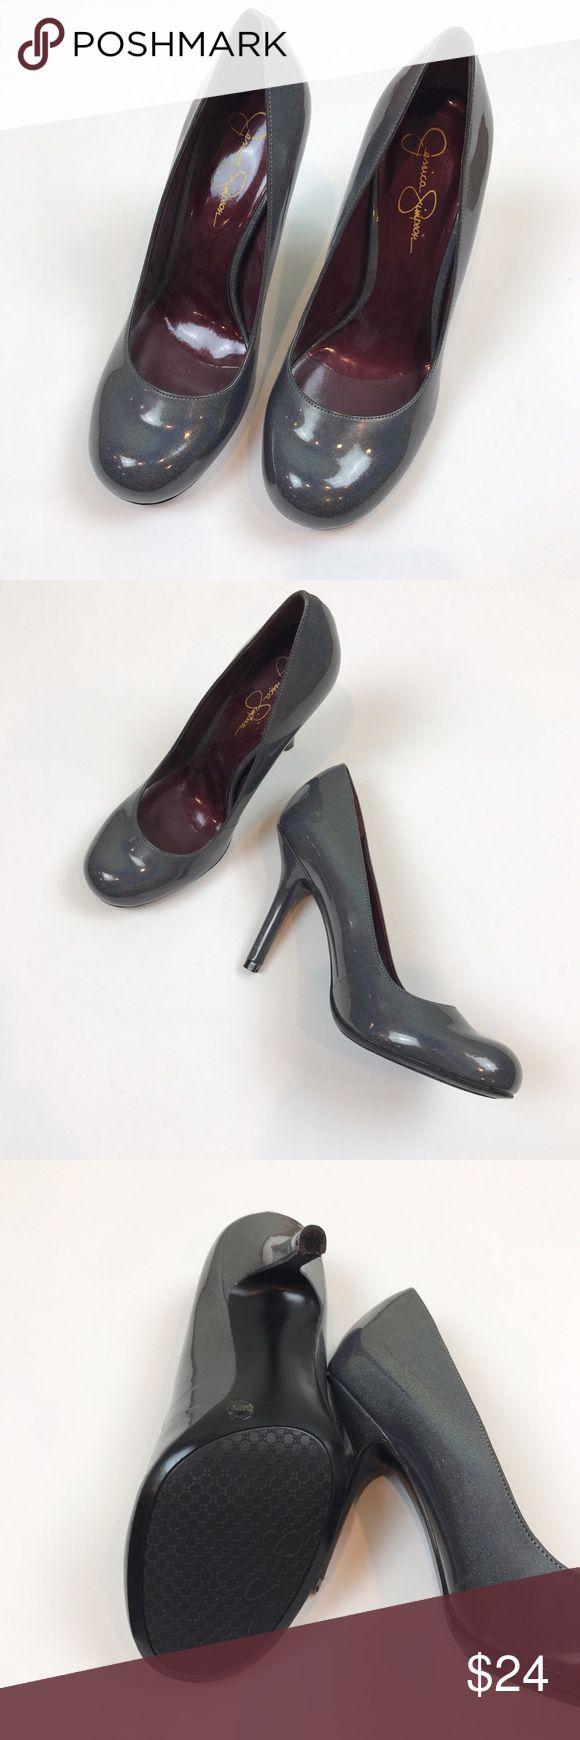 Jessica Simpson NWOT gray sparkle heels size 7.5 Jessica Simpson NWOT gray sparkle patent heels size 7.5. Heel is 4inches. Jessica Simpson Shoes Heels